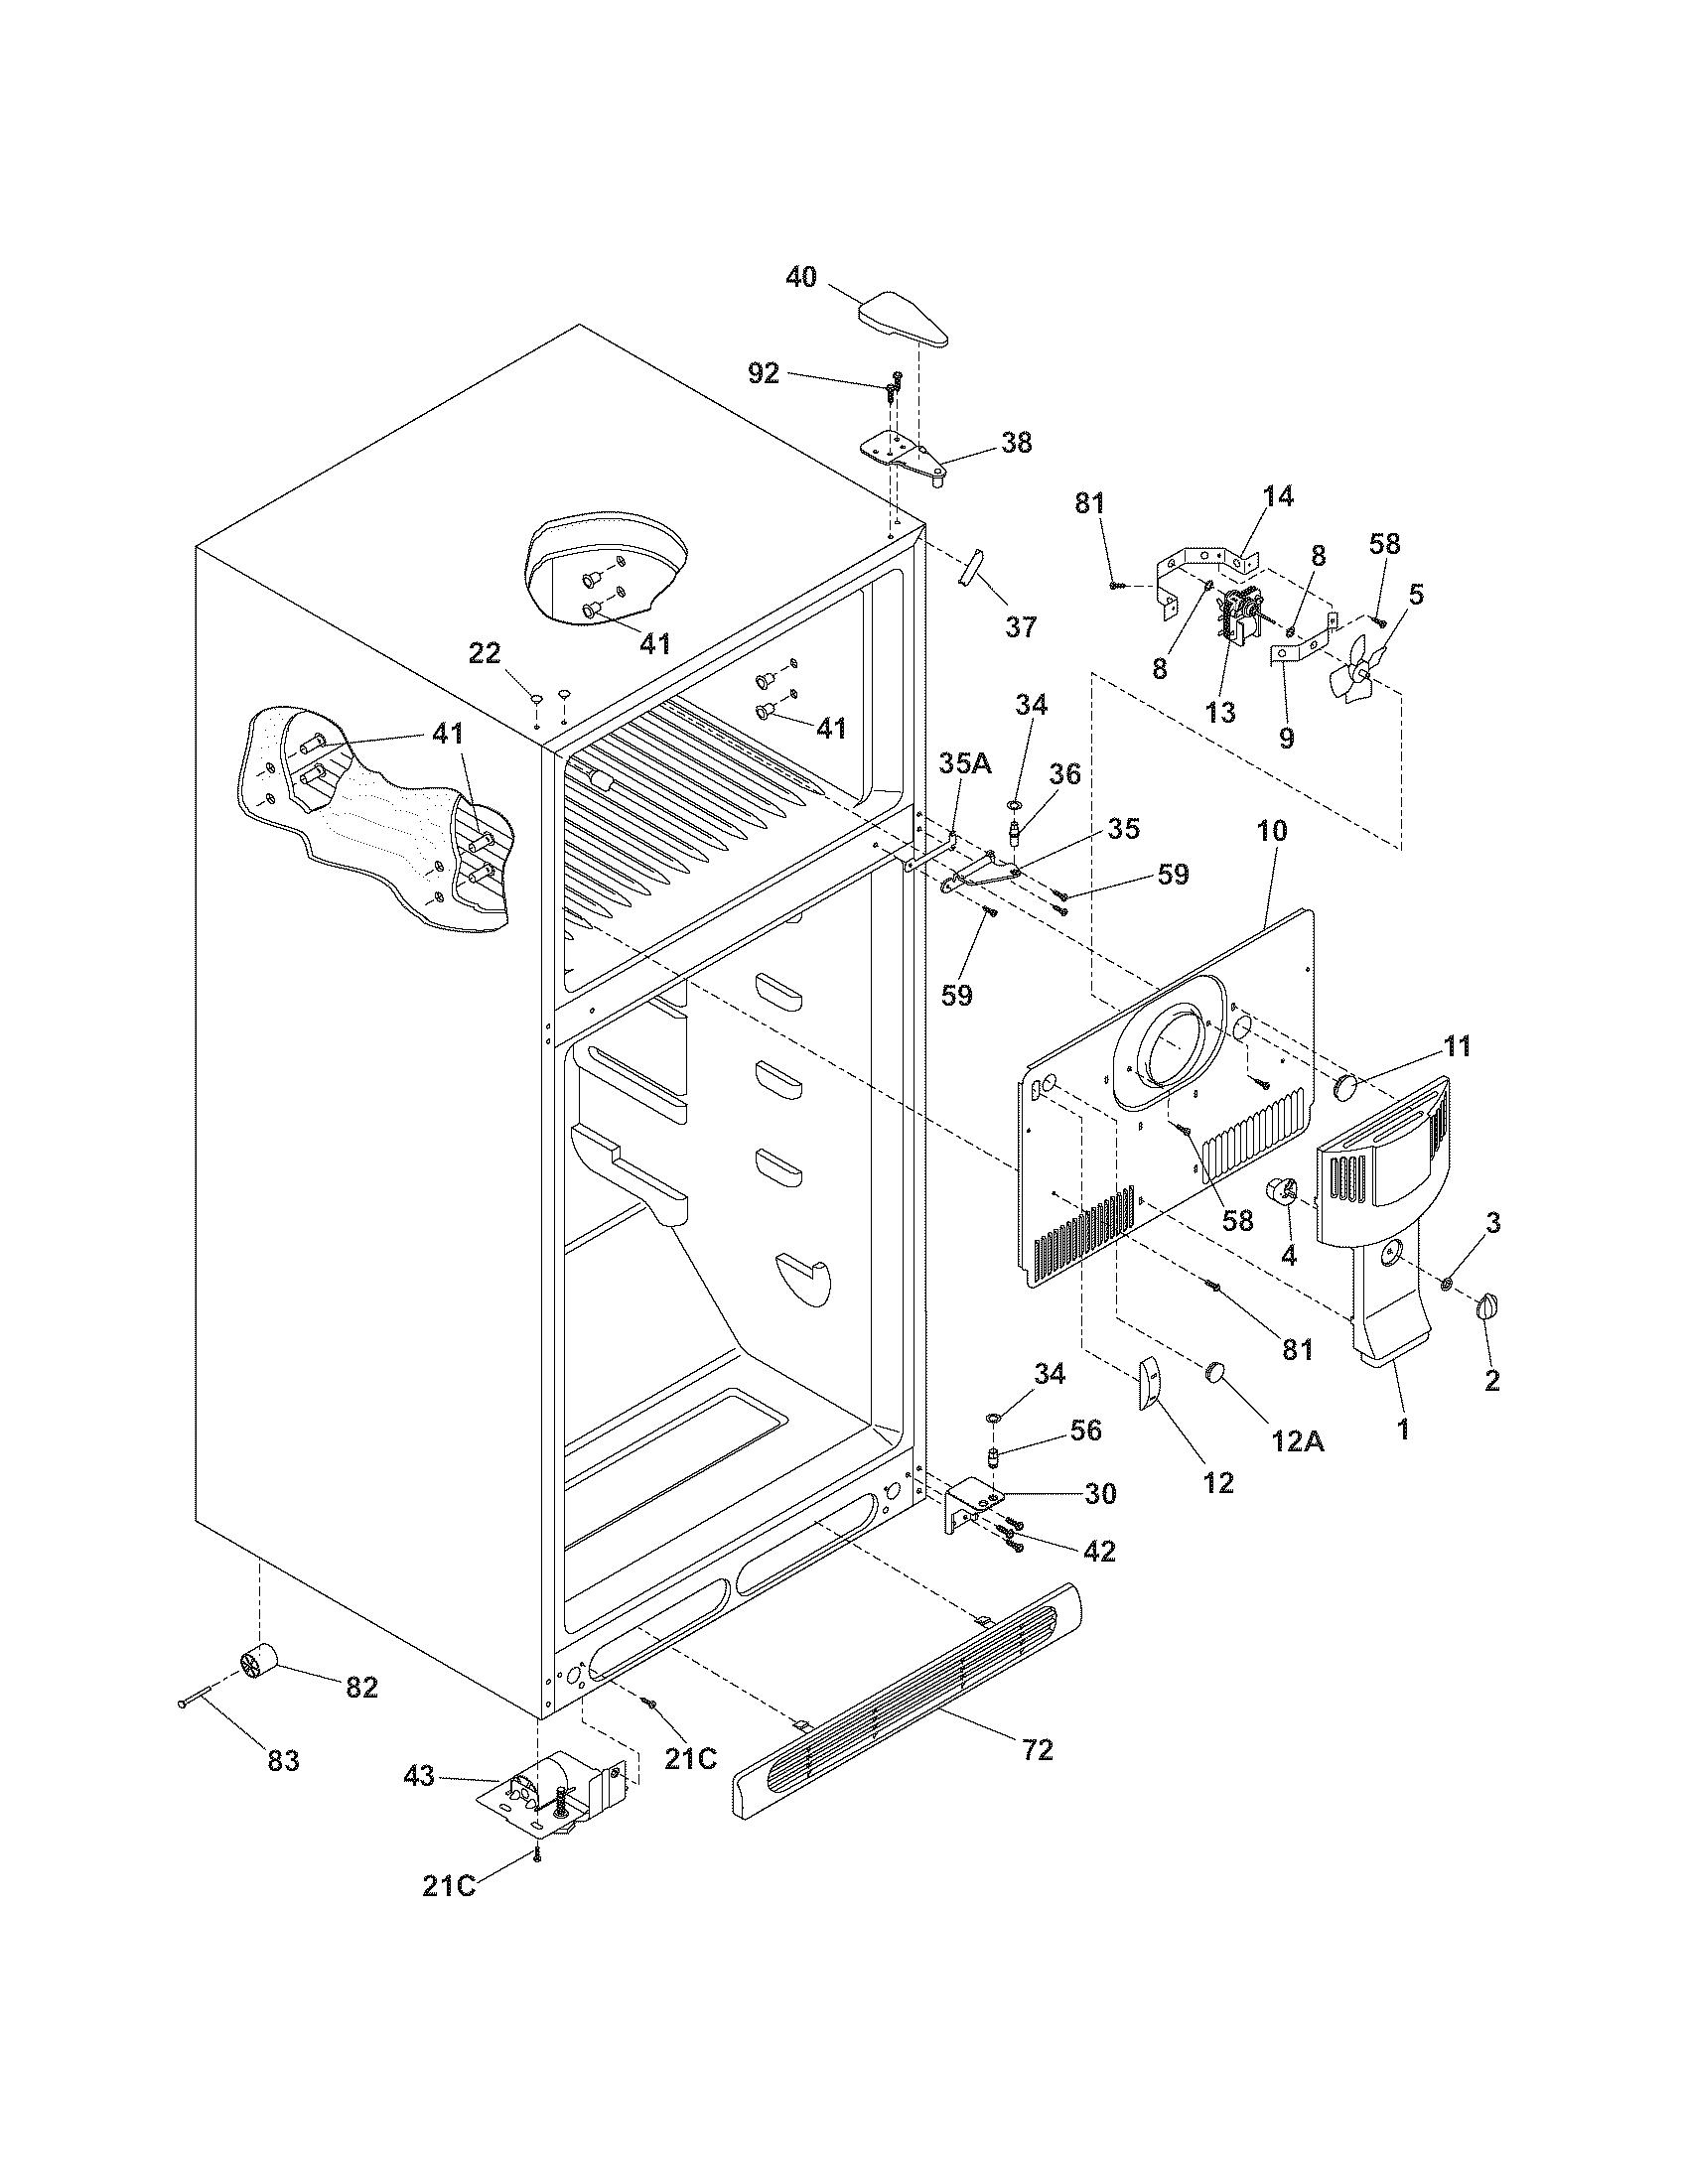 hight resolution of kenmore refrigerator relay wiring diagram wiring library kenmore heating element wiring diagram kenmore model 25365812508 top